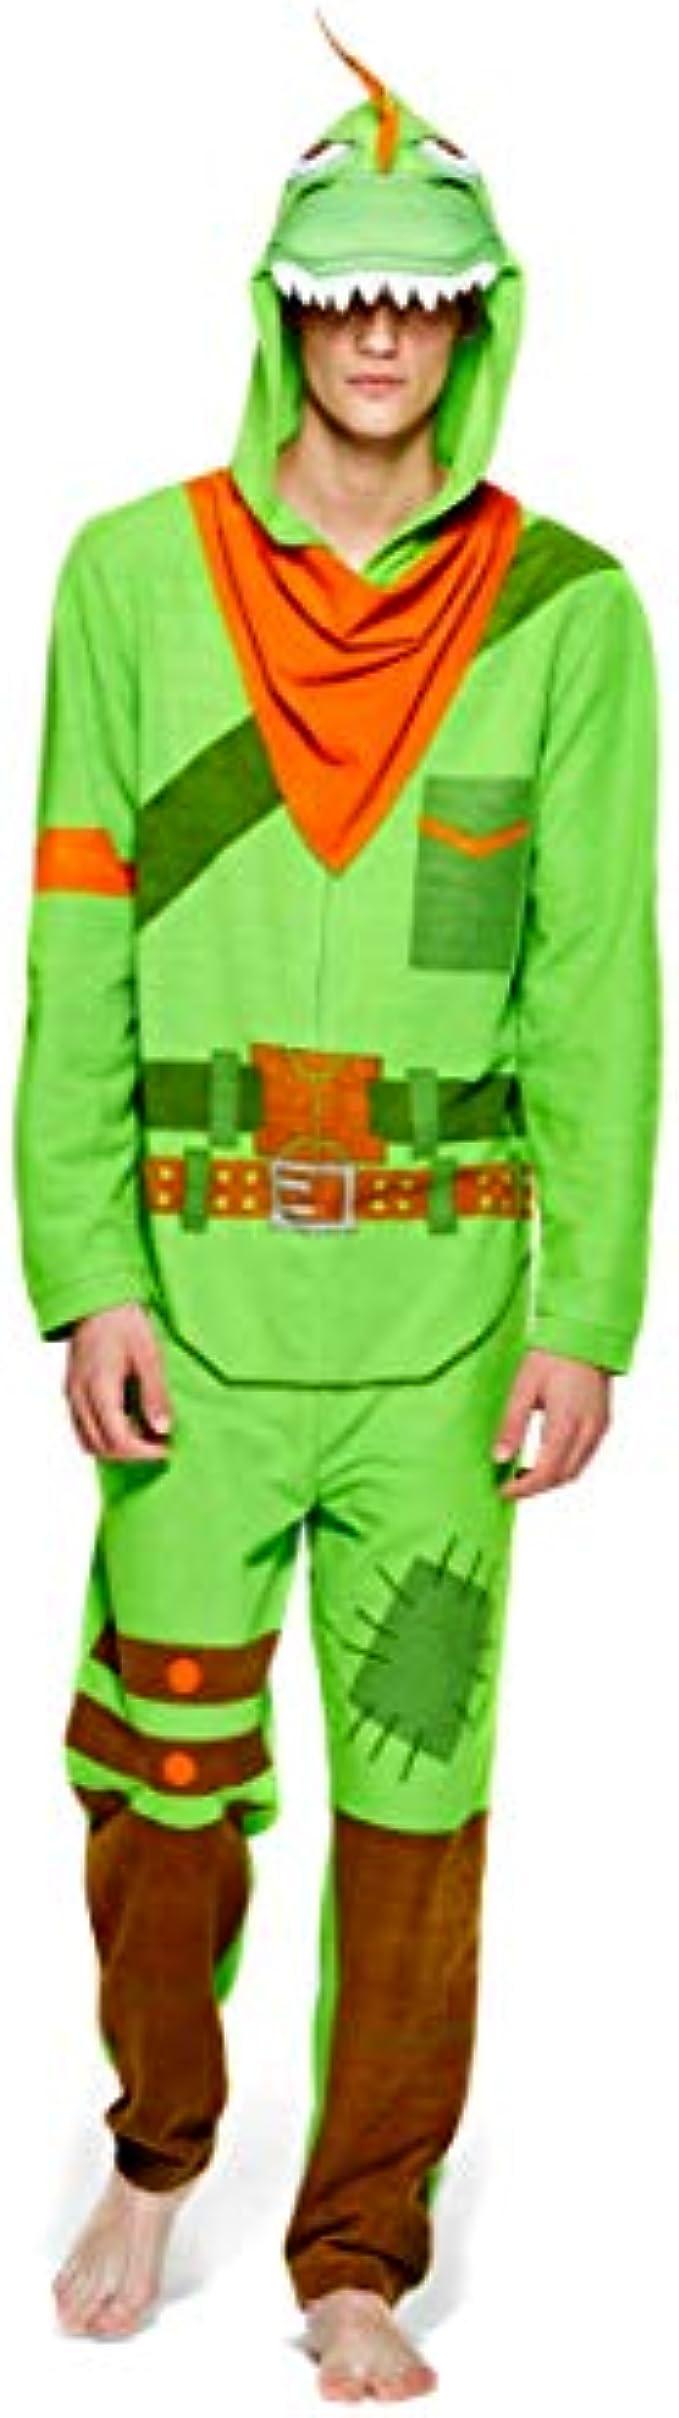 Epic Games Fortnite Rex Mens Union Suit - Onezie Adult Costume Sleeper